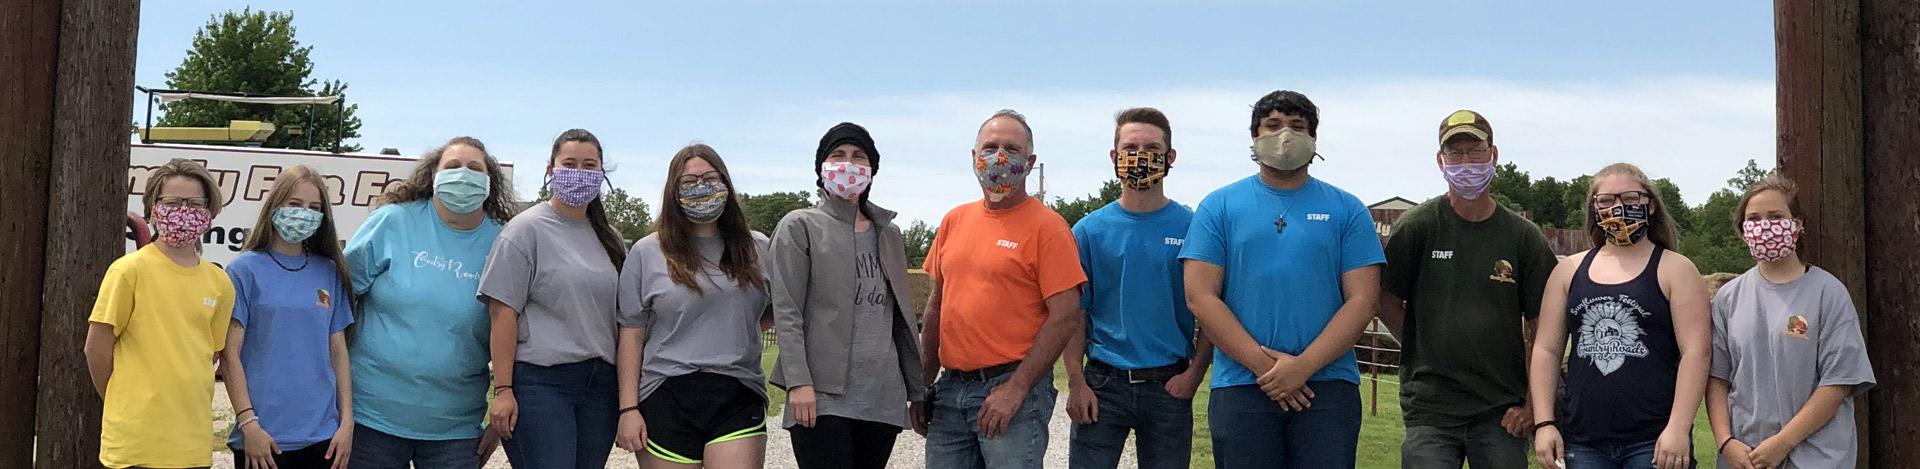 Country Roads Staff - Prepared for COVID-19